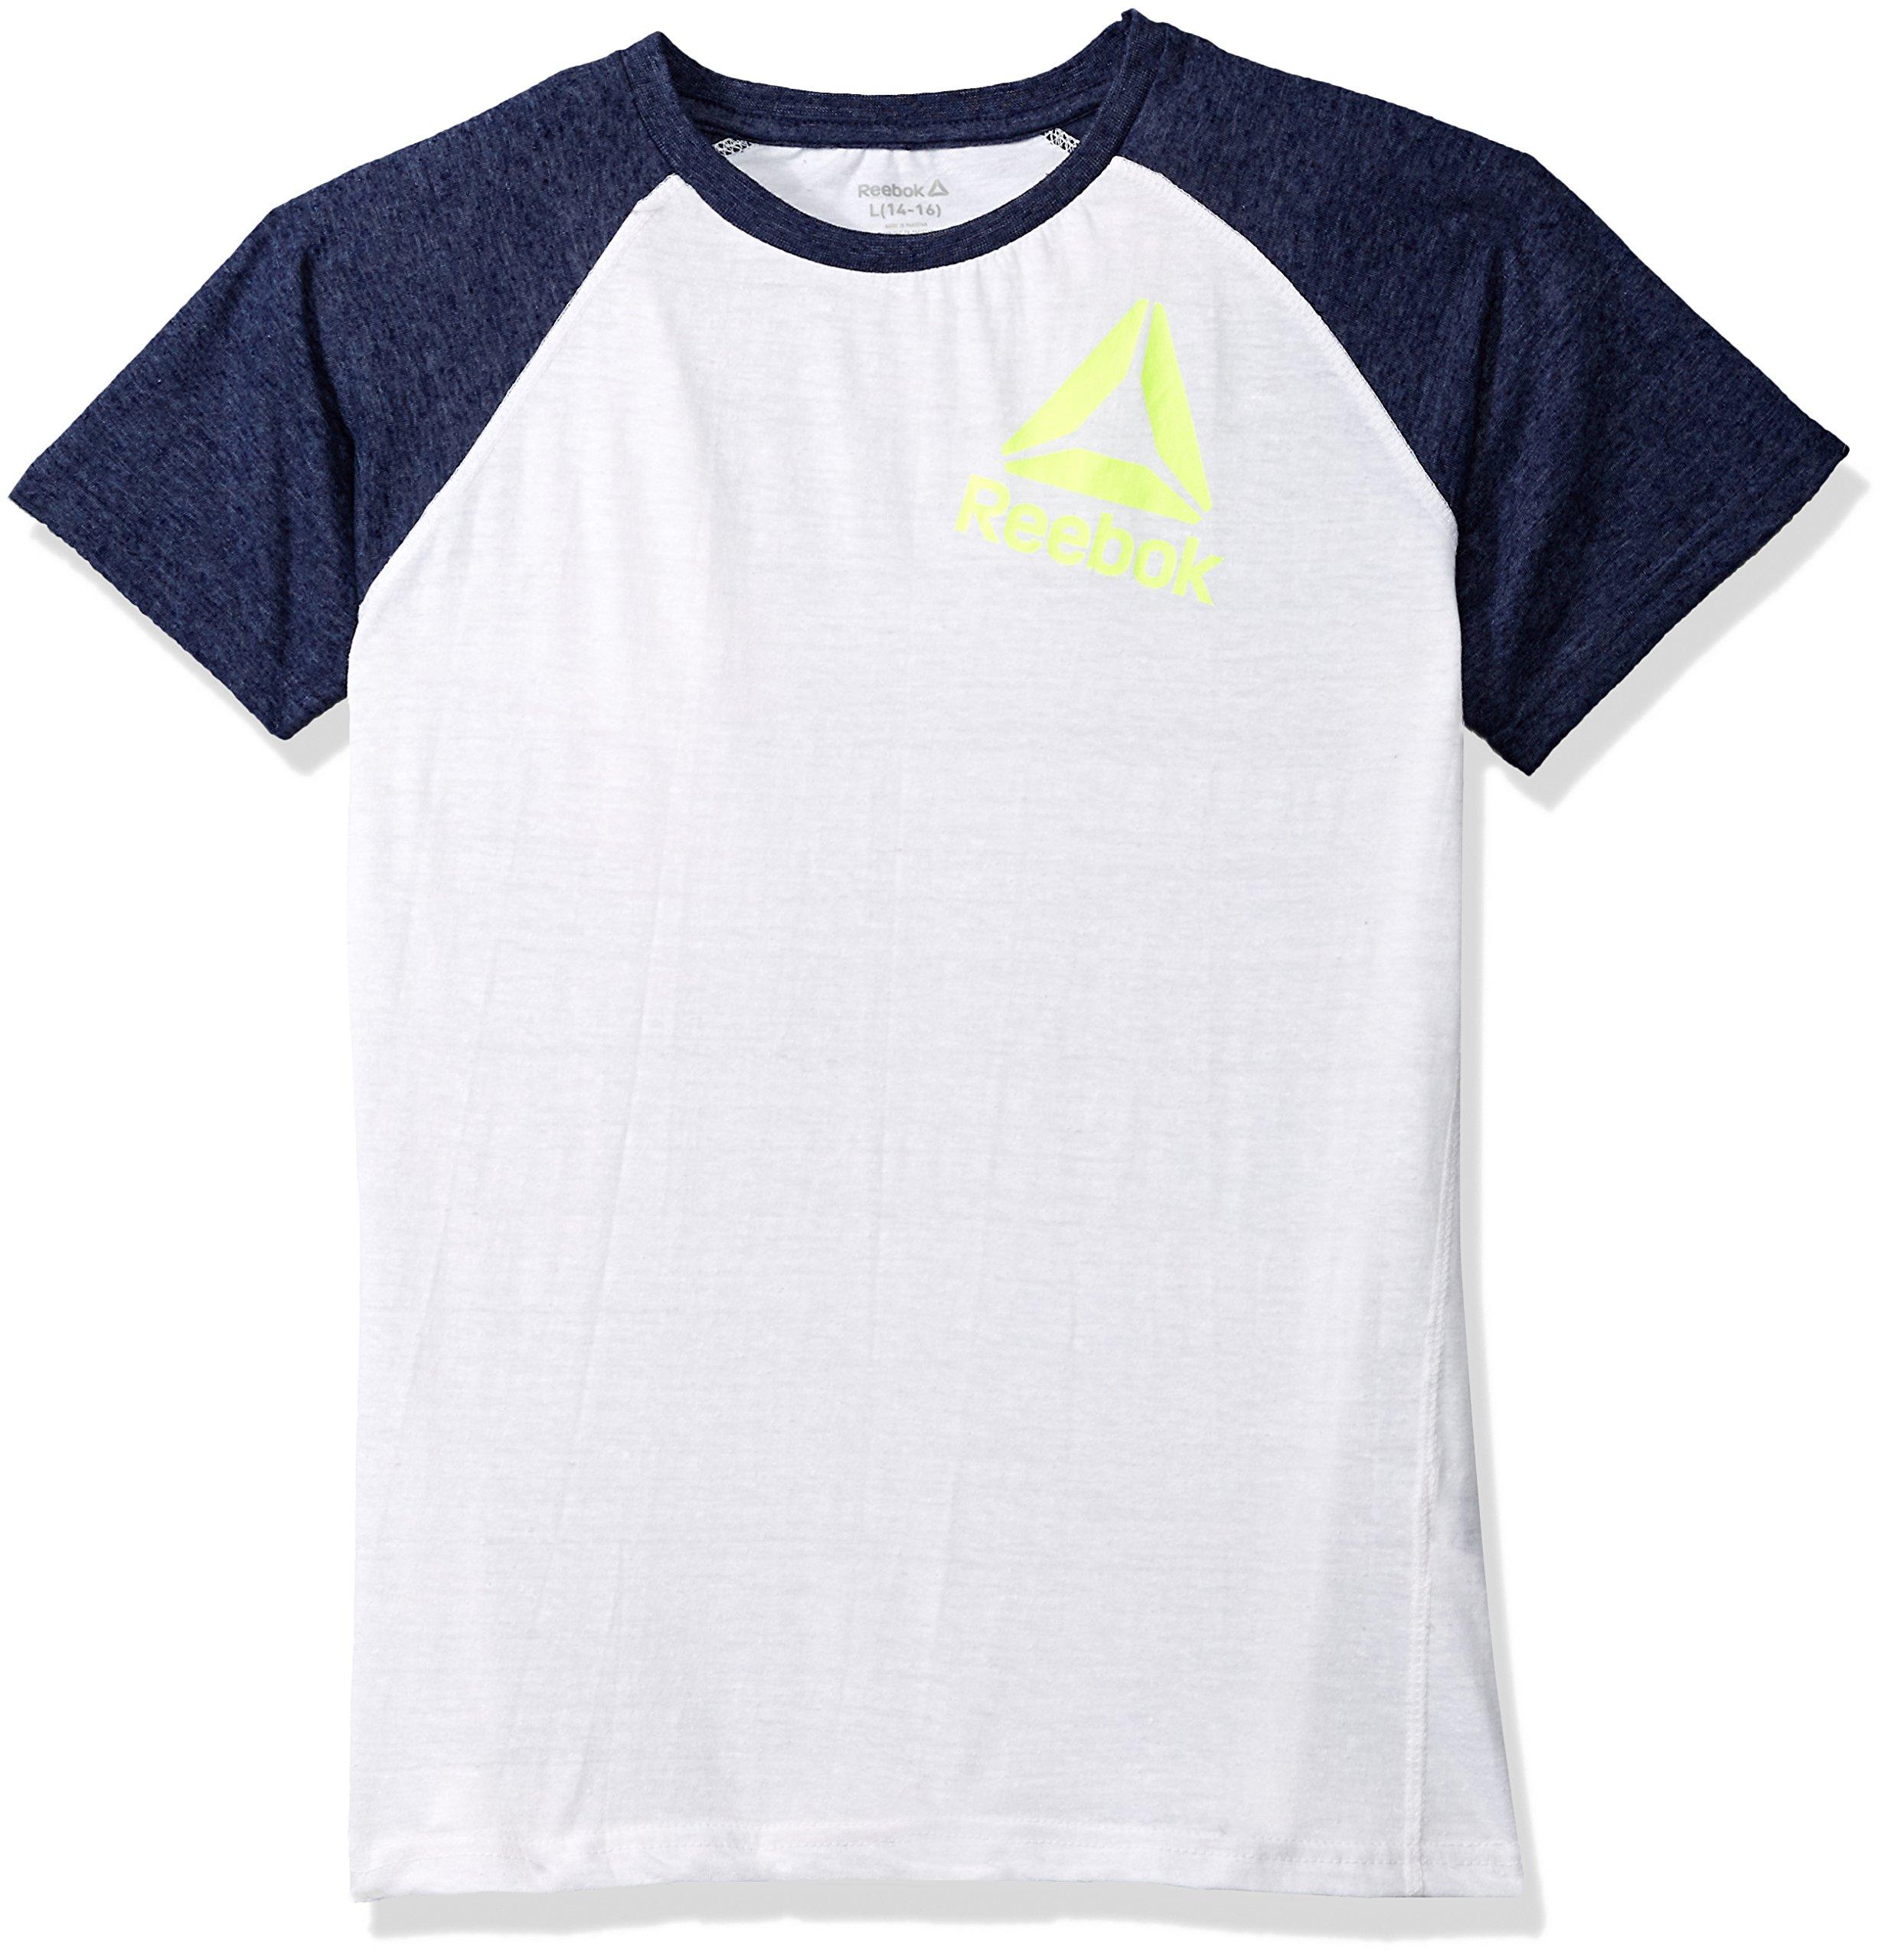 Reebok Big Boys' Athletic T-Shirt, True White-Bbcxp, 18/20